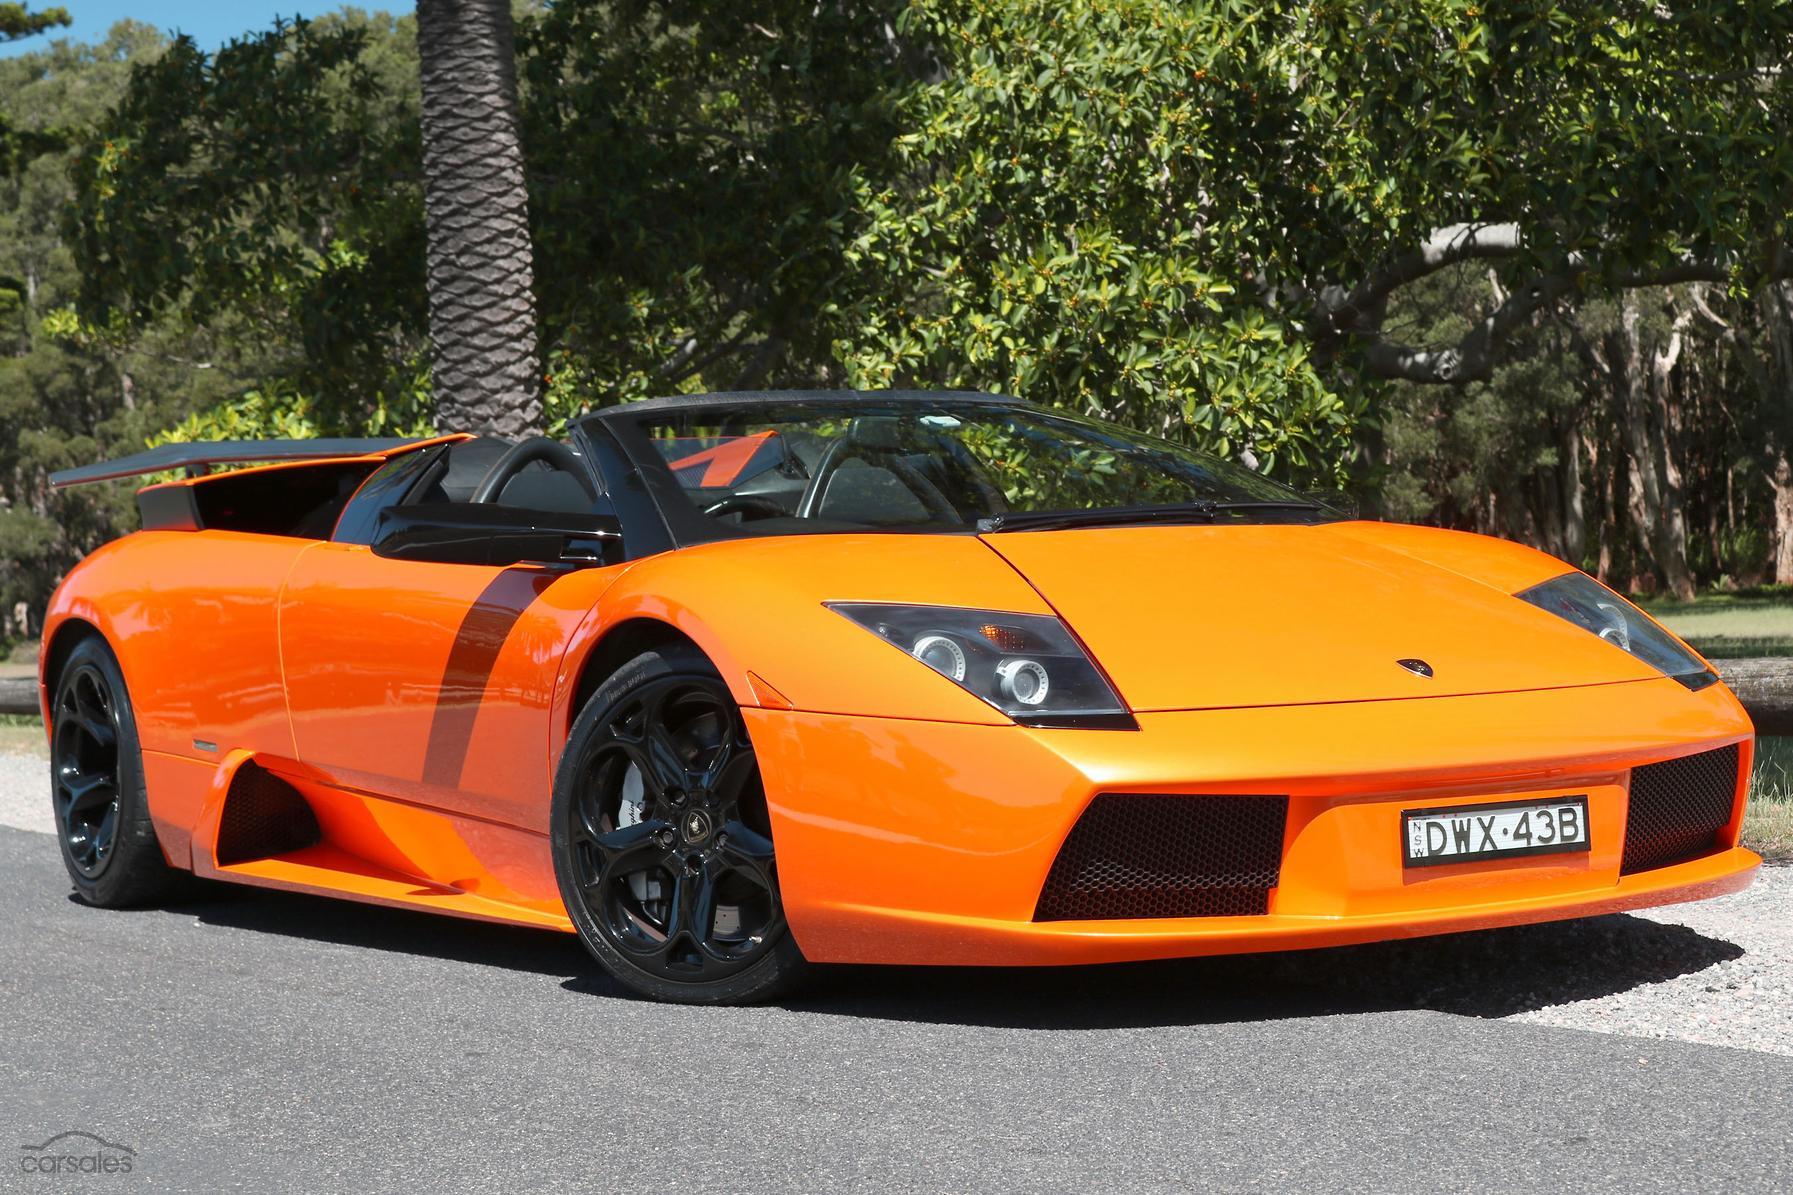 2005 Lamborghini Murcielago Auto Awd Sse Ad 5924782 Carsales Com Au